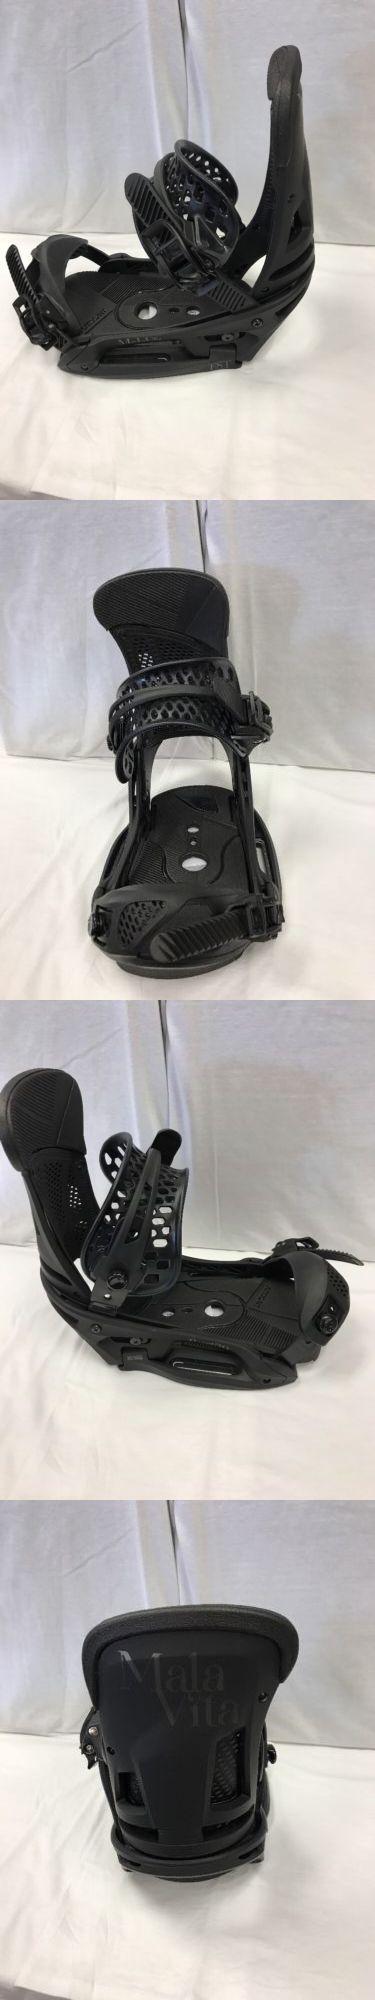 Bindings 21248: Brand New 2017 Burton Malavita Est Snowboard Bindings Size Large -> BUY IT NOW ONLY: $260 on eBay!